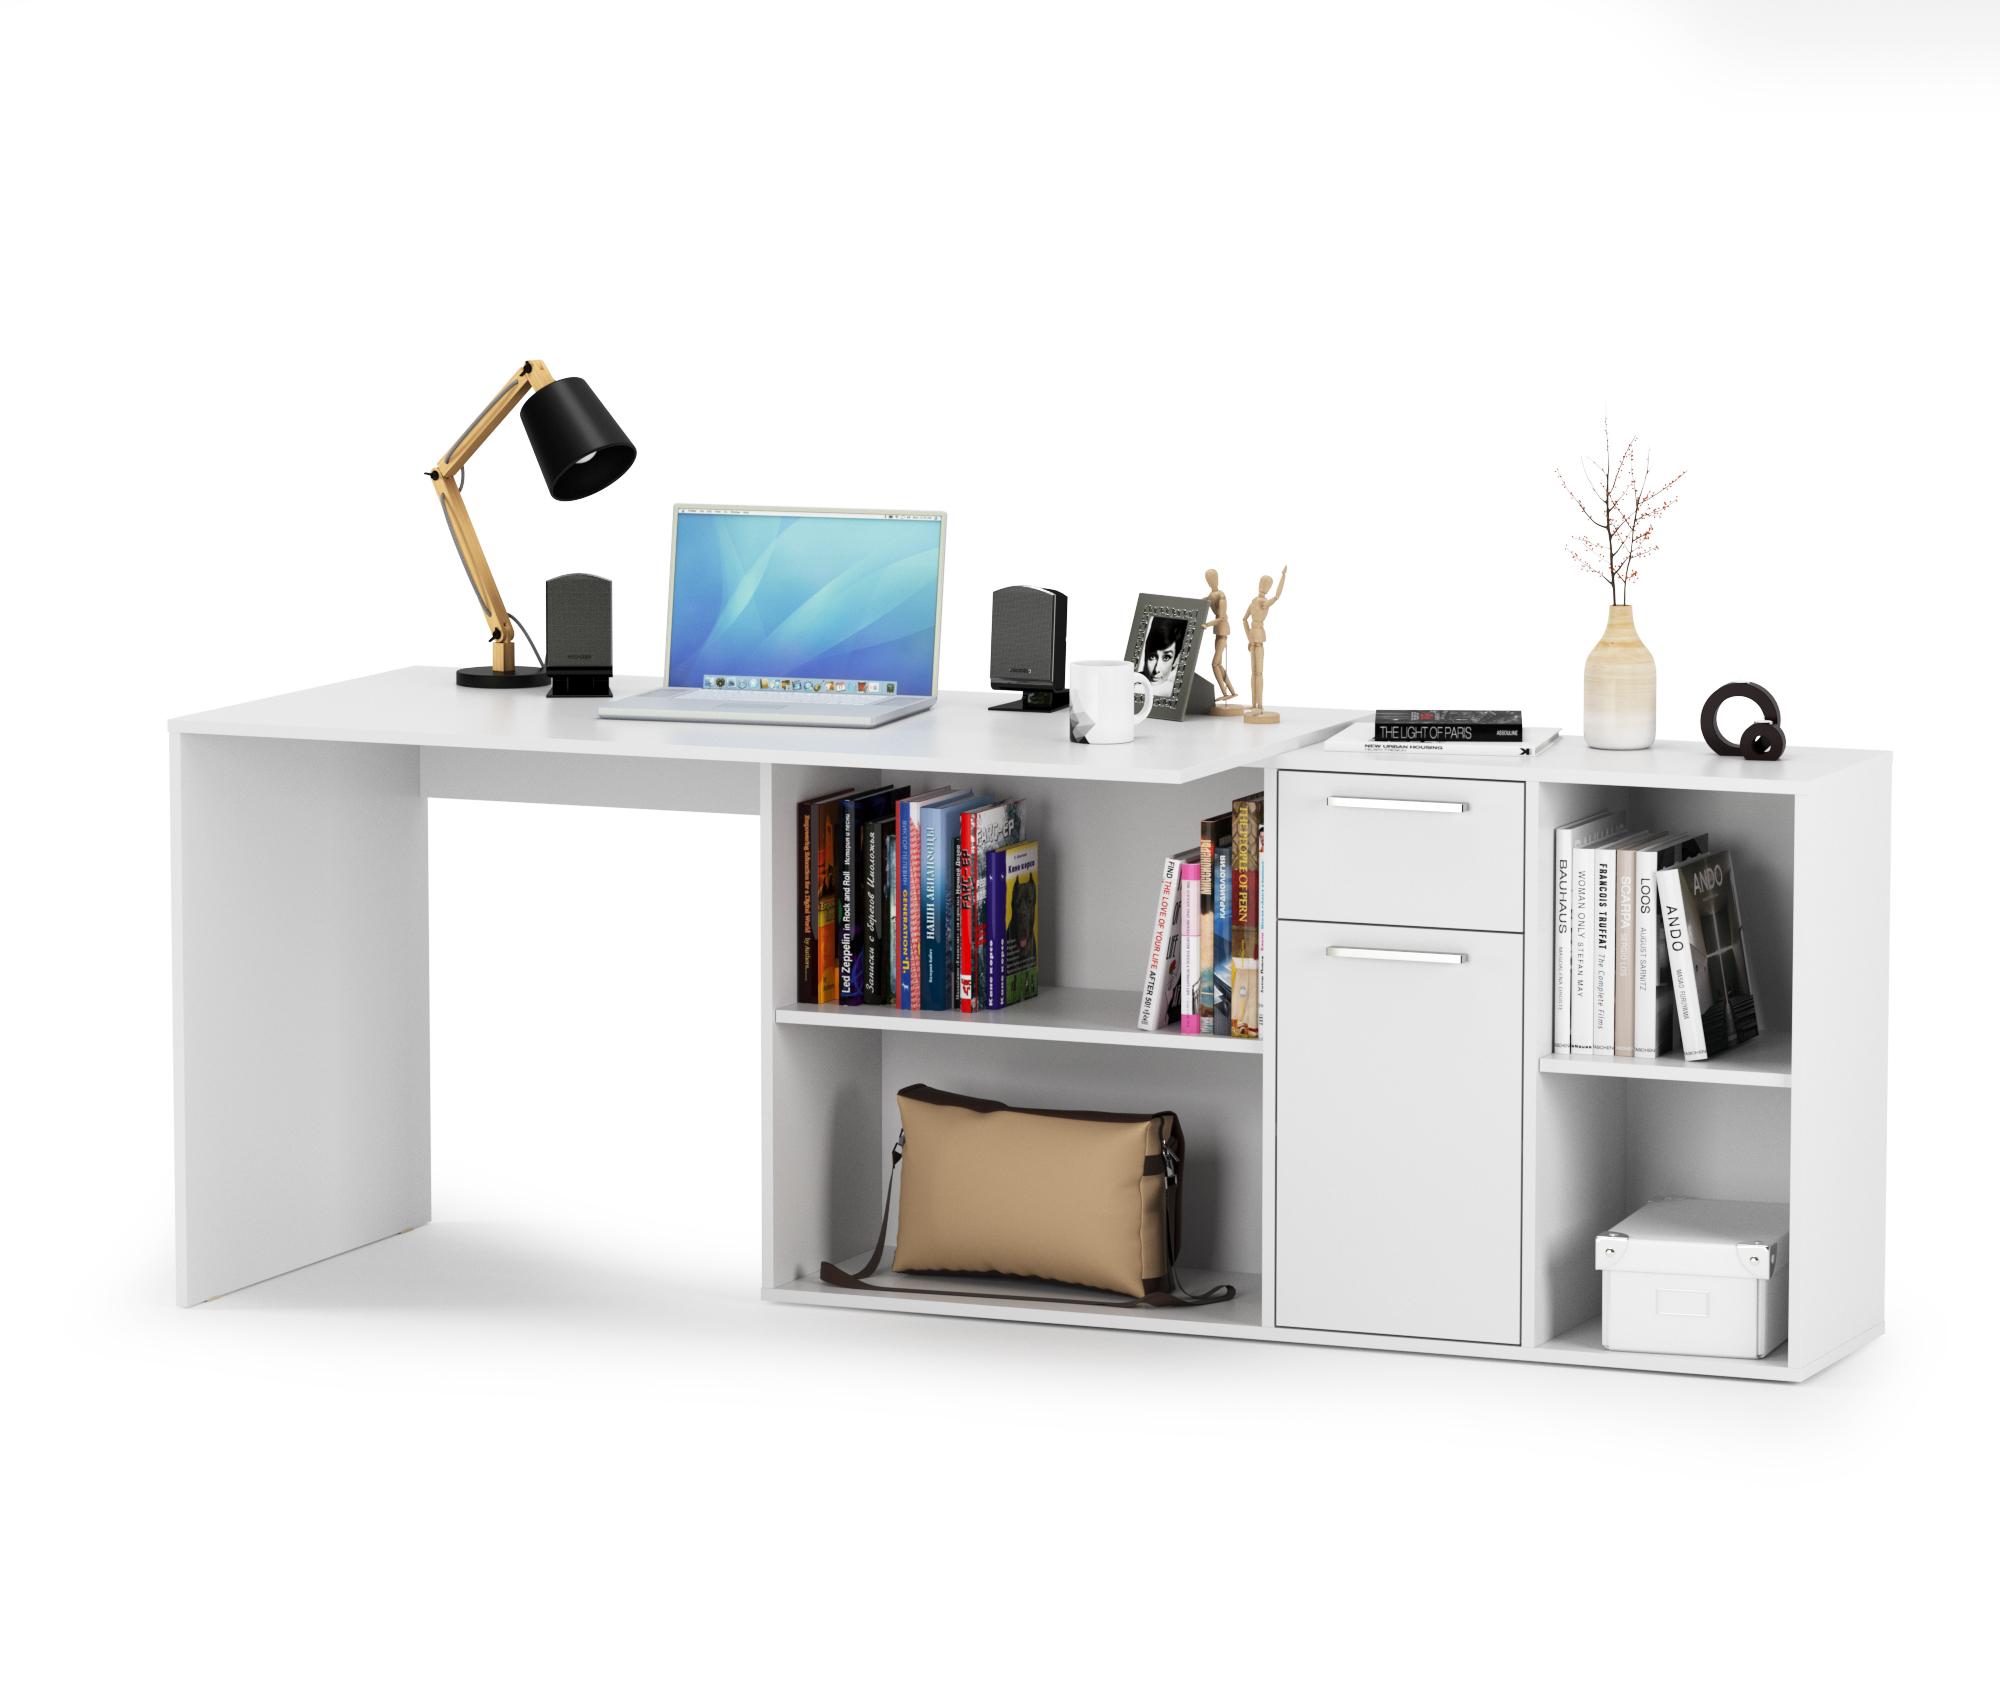 Стол письменный Mobi Лайт 03.245 белый, 136х139,2х75,2 см.(угловой) или 203,5х68х75,2 см